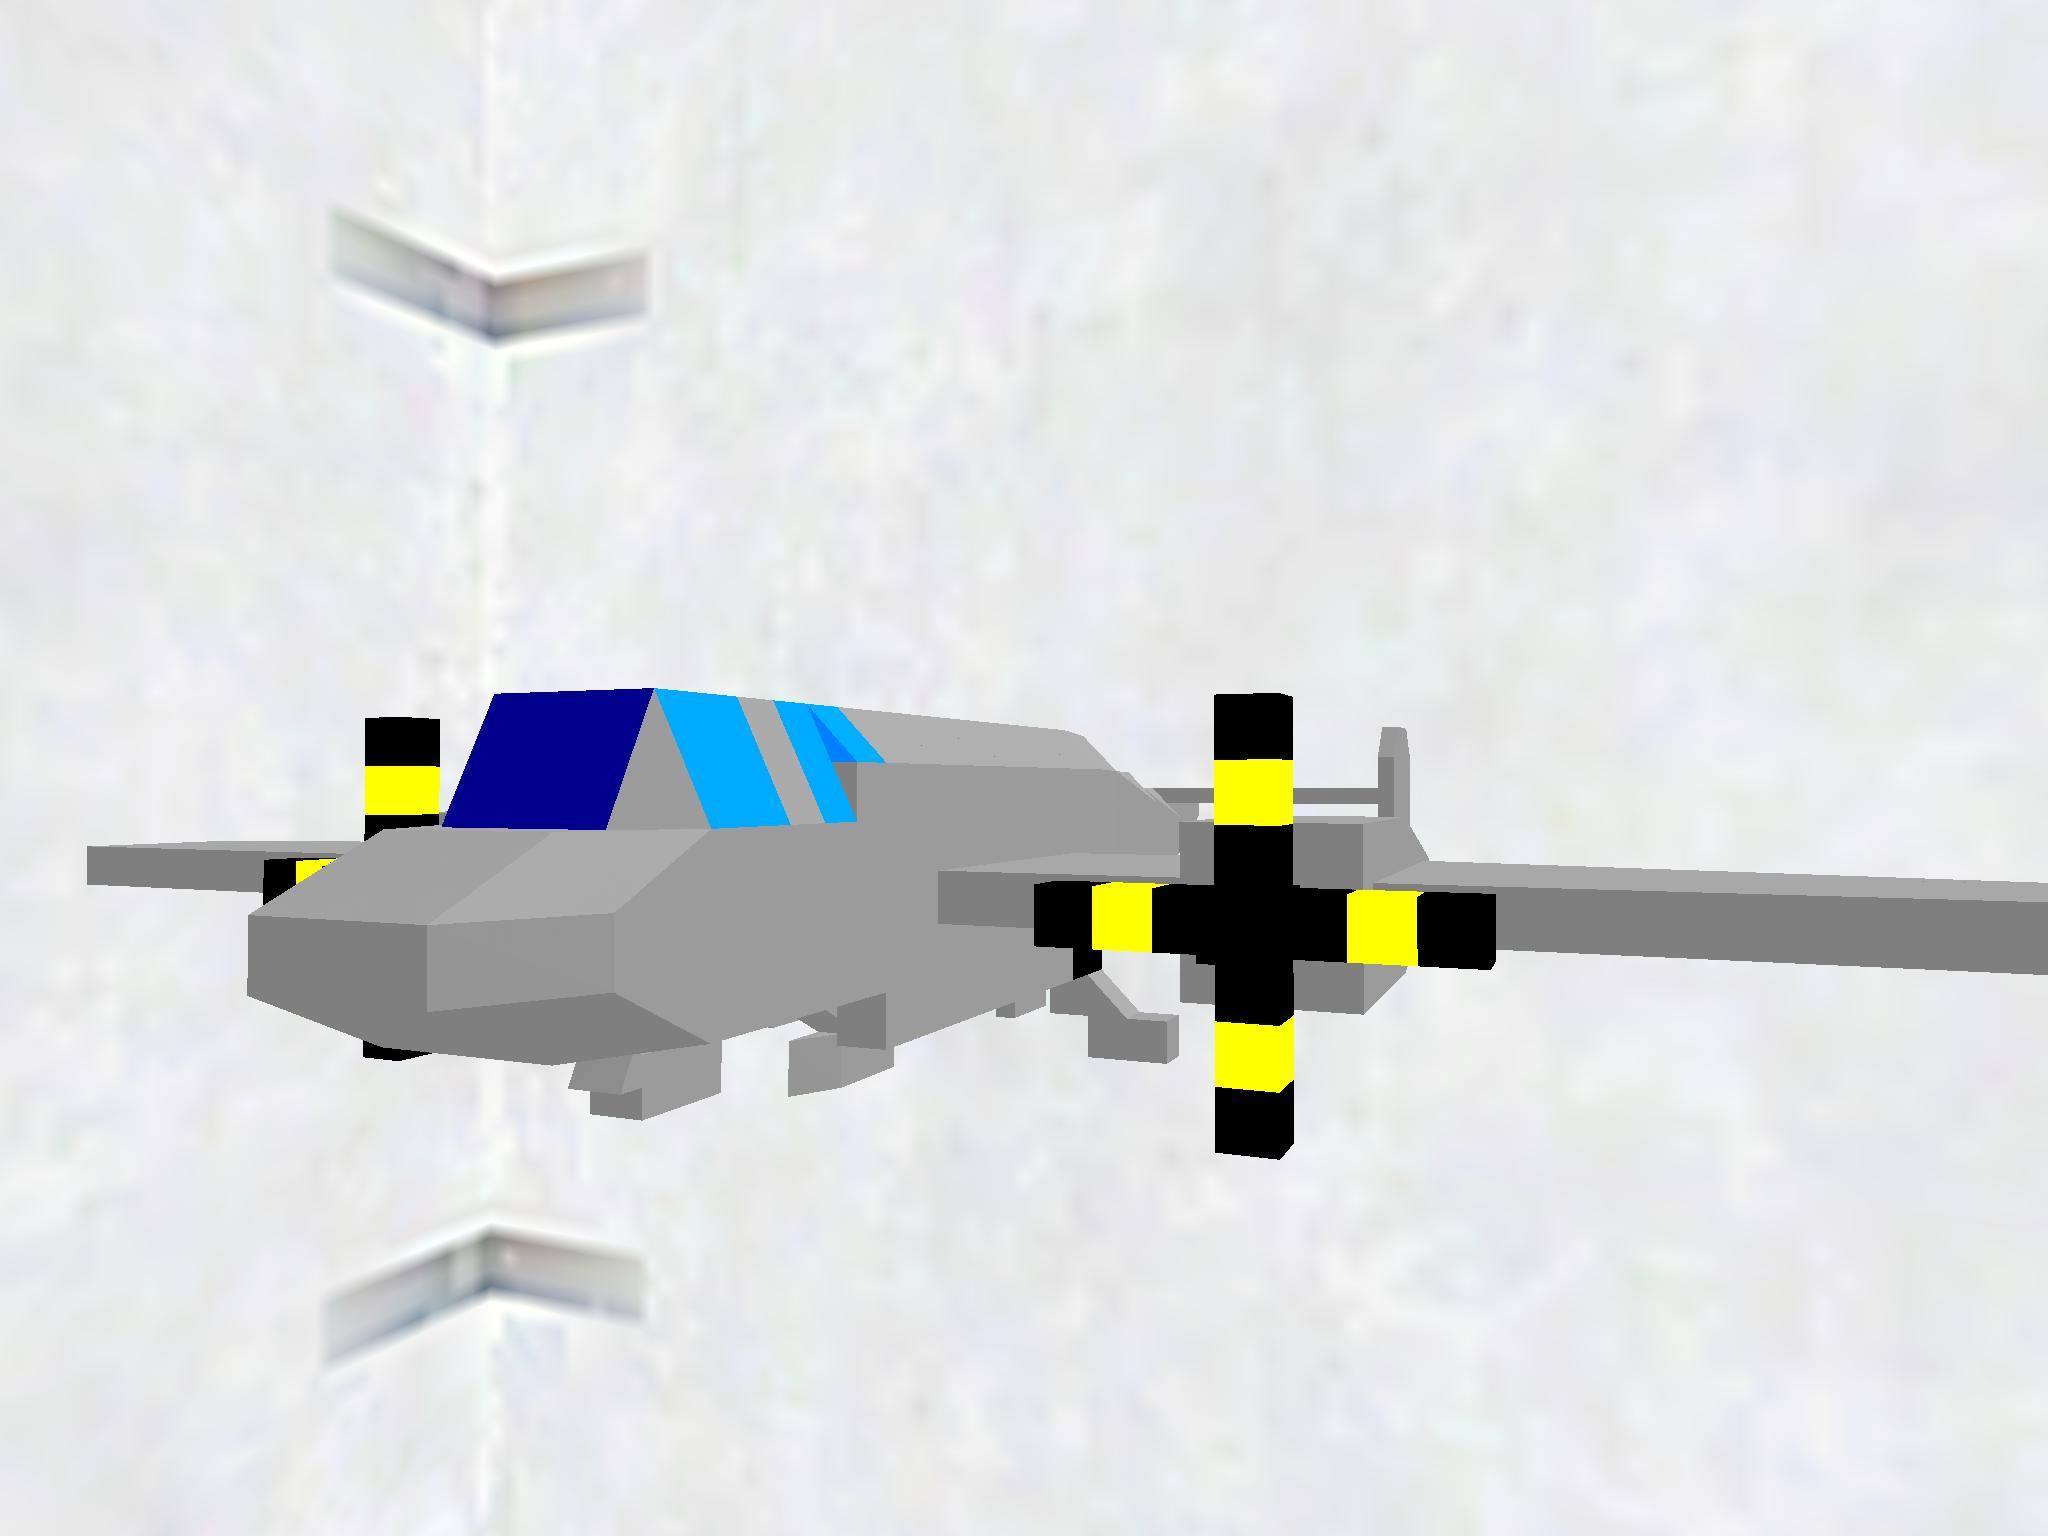 XAB 1  テストバマー